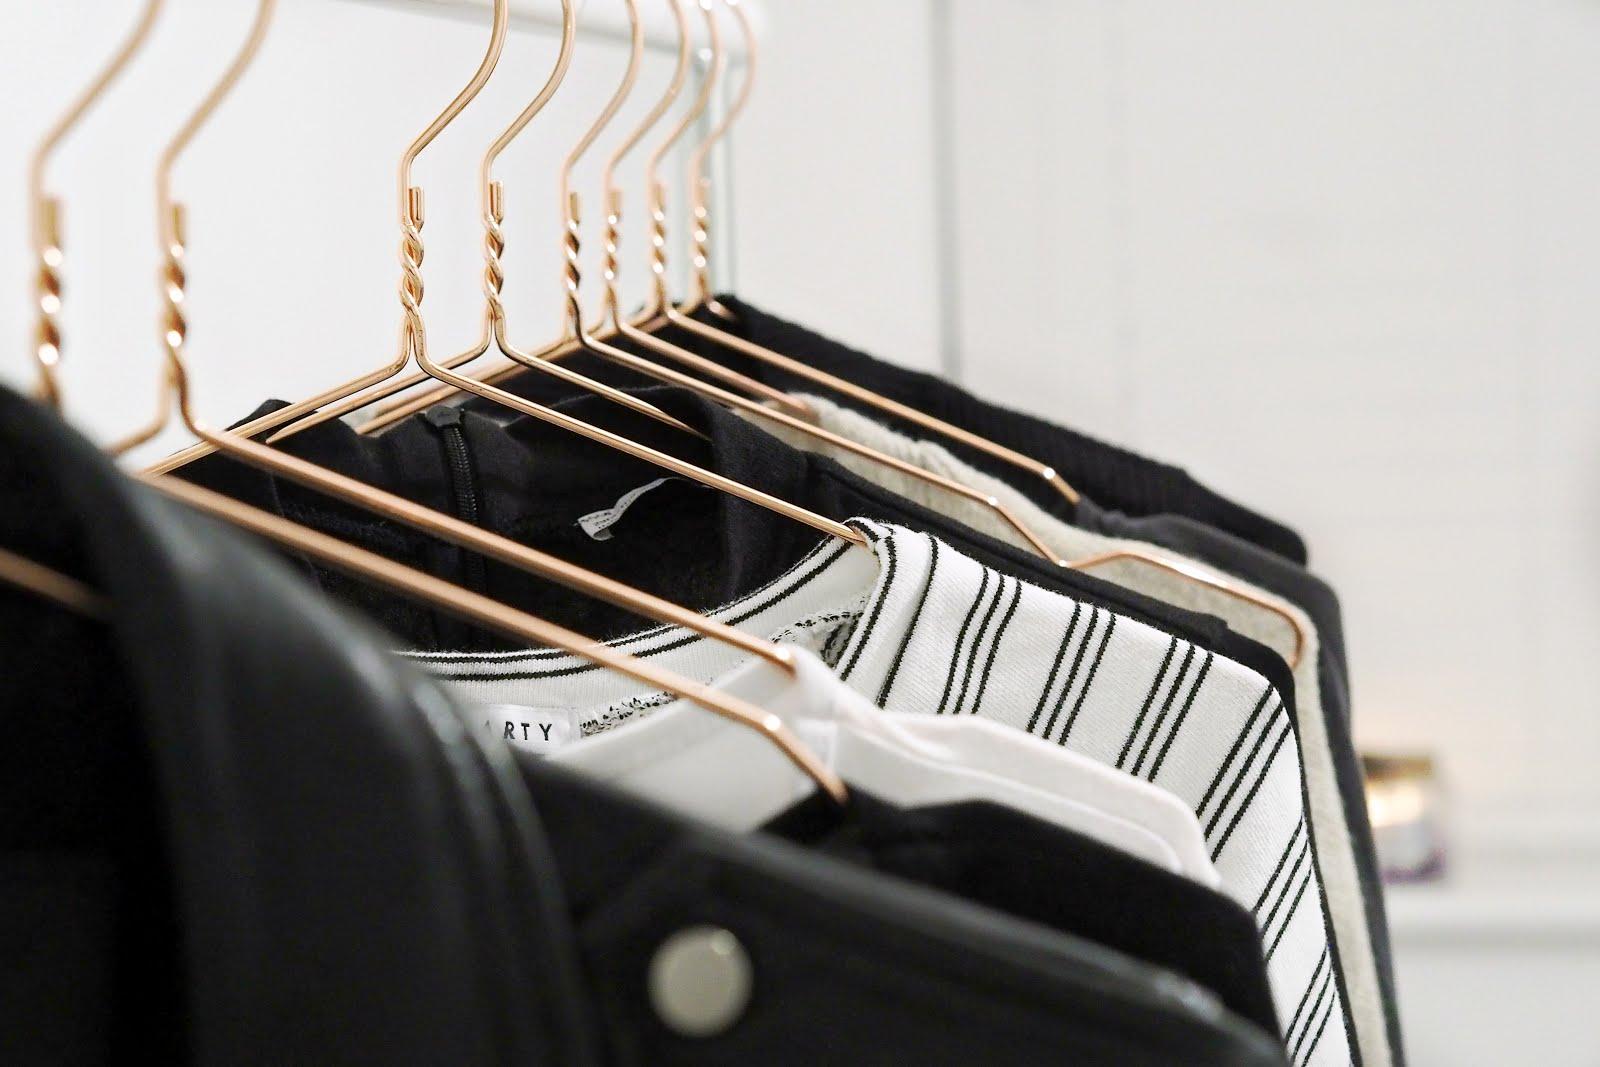 basics for year round capsule wardrobe, copper garden